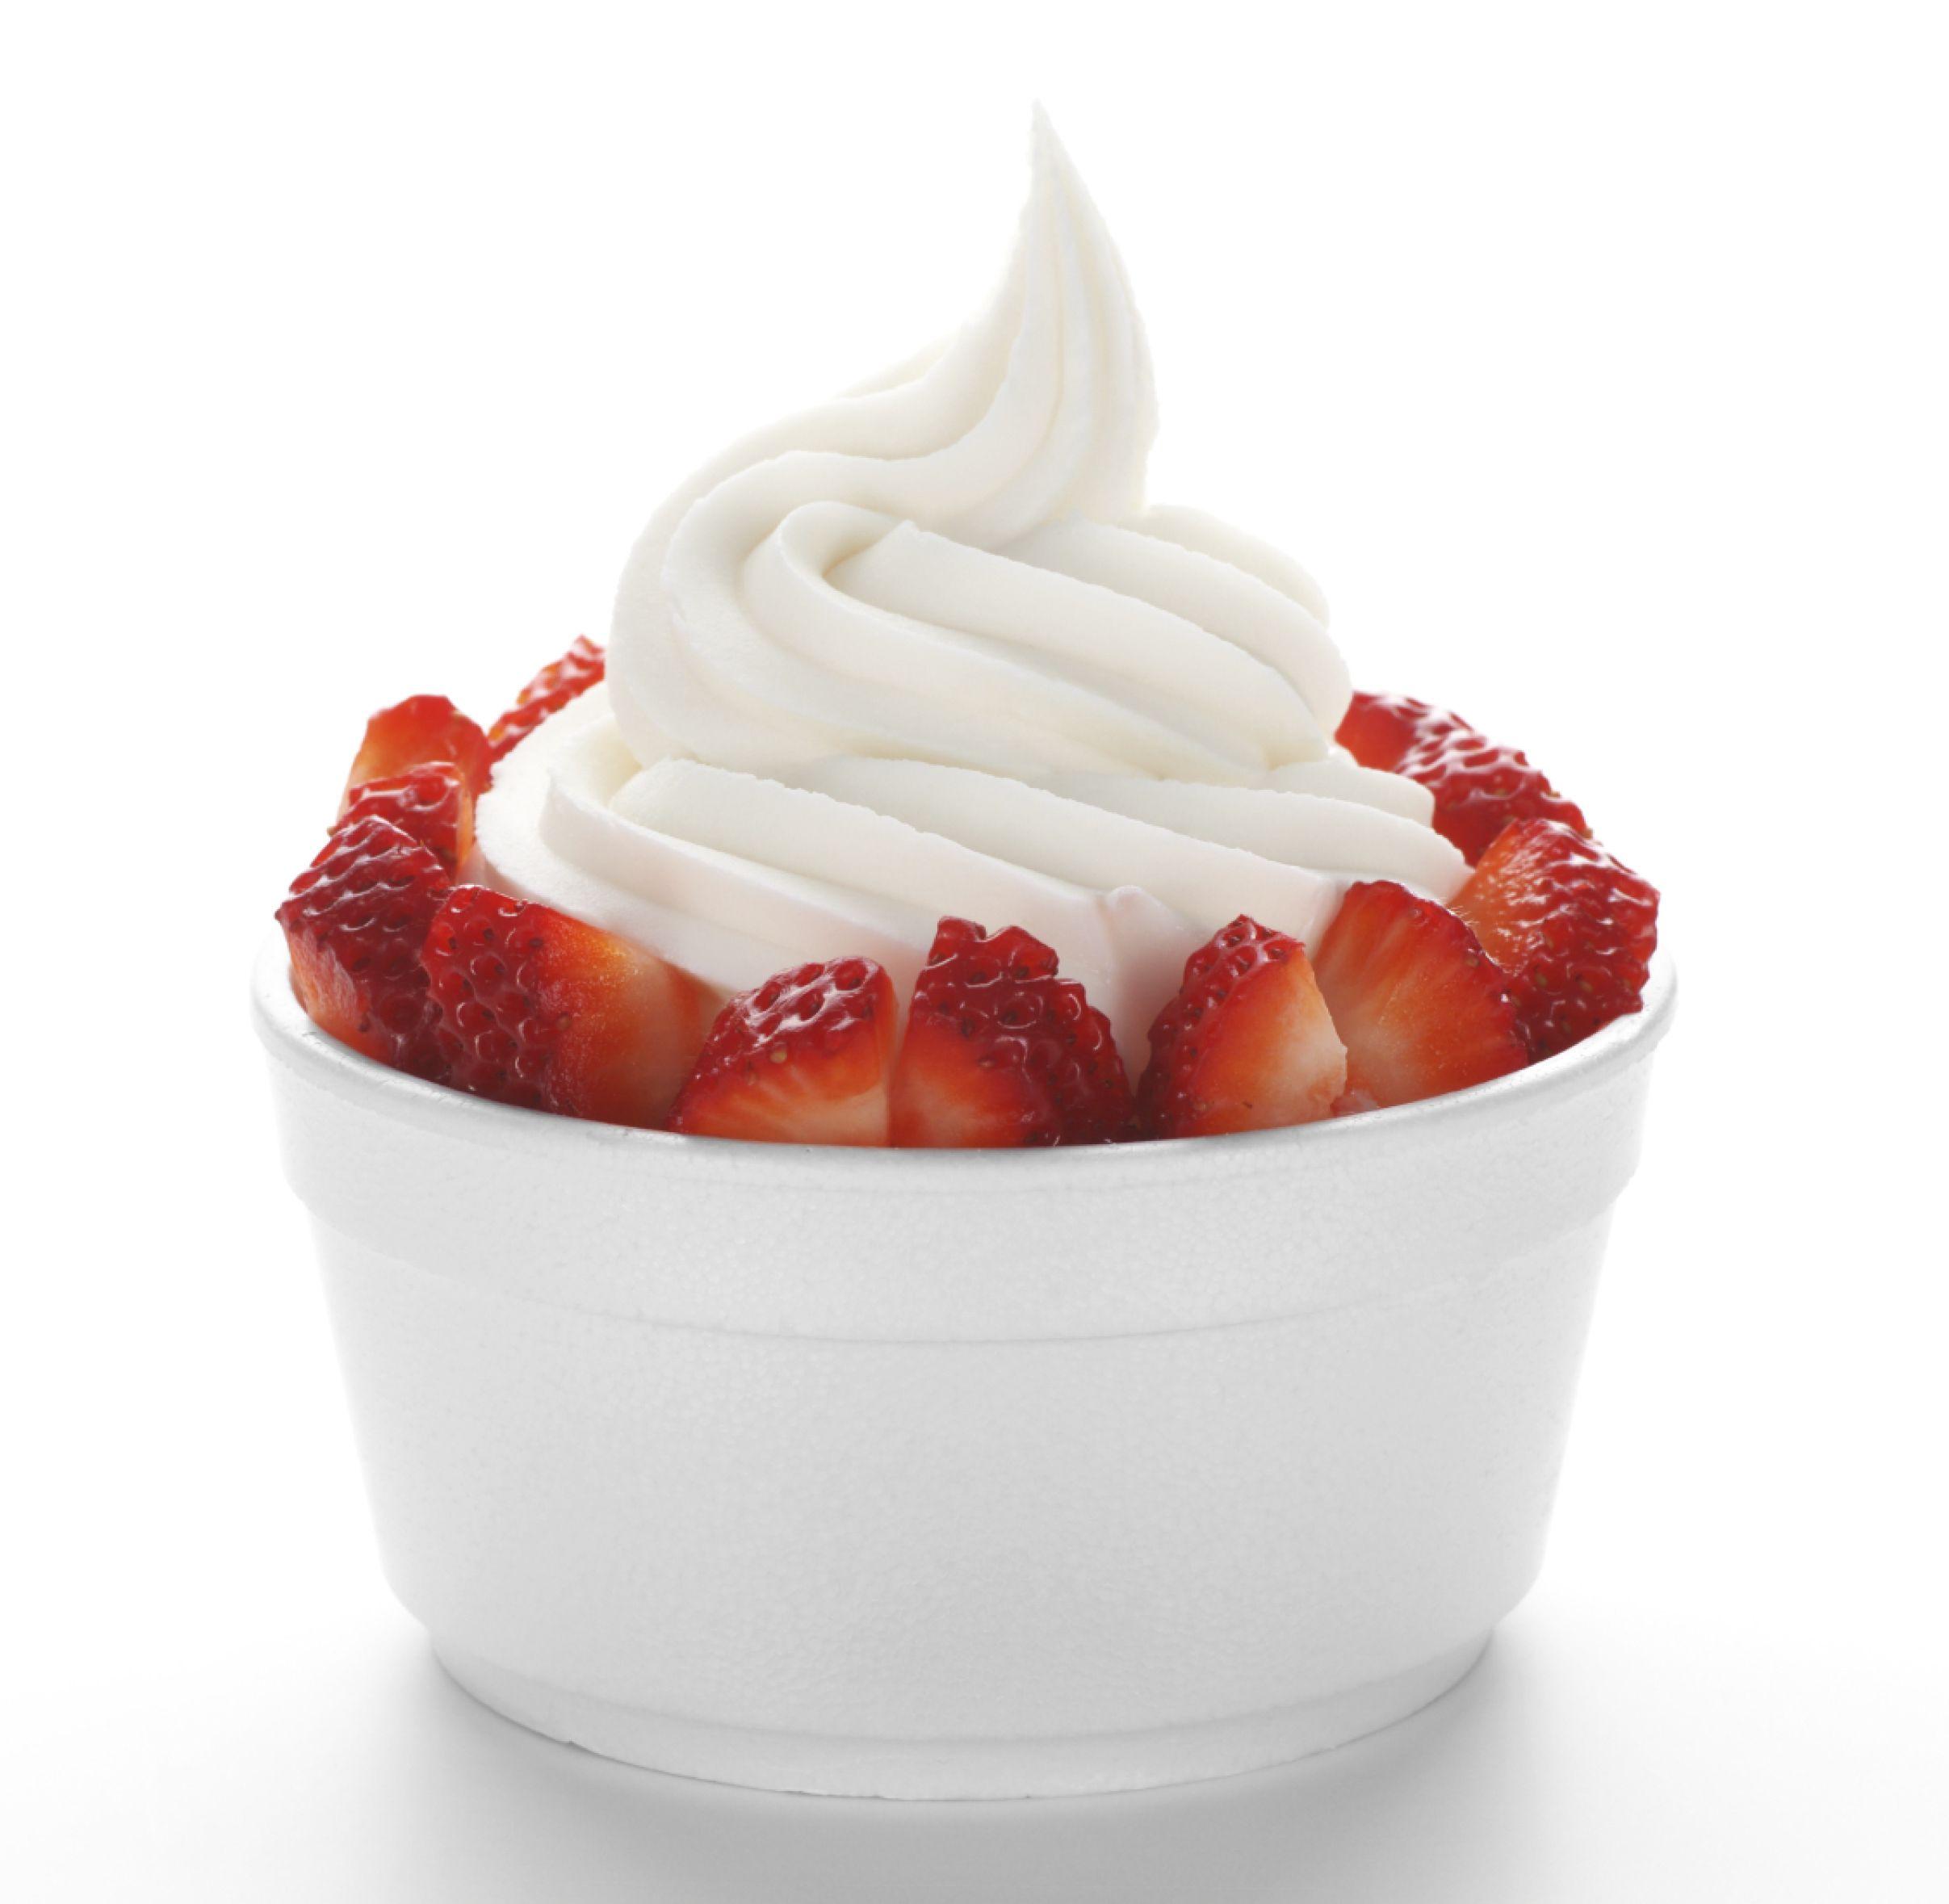 Frozen Yogurt images ❤ Frozen Yoghurt ❤ HD wallpaper and background photos - Yogurt HD PNG